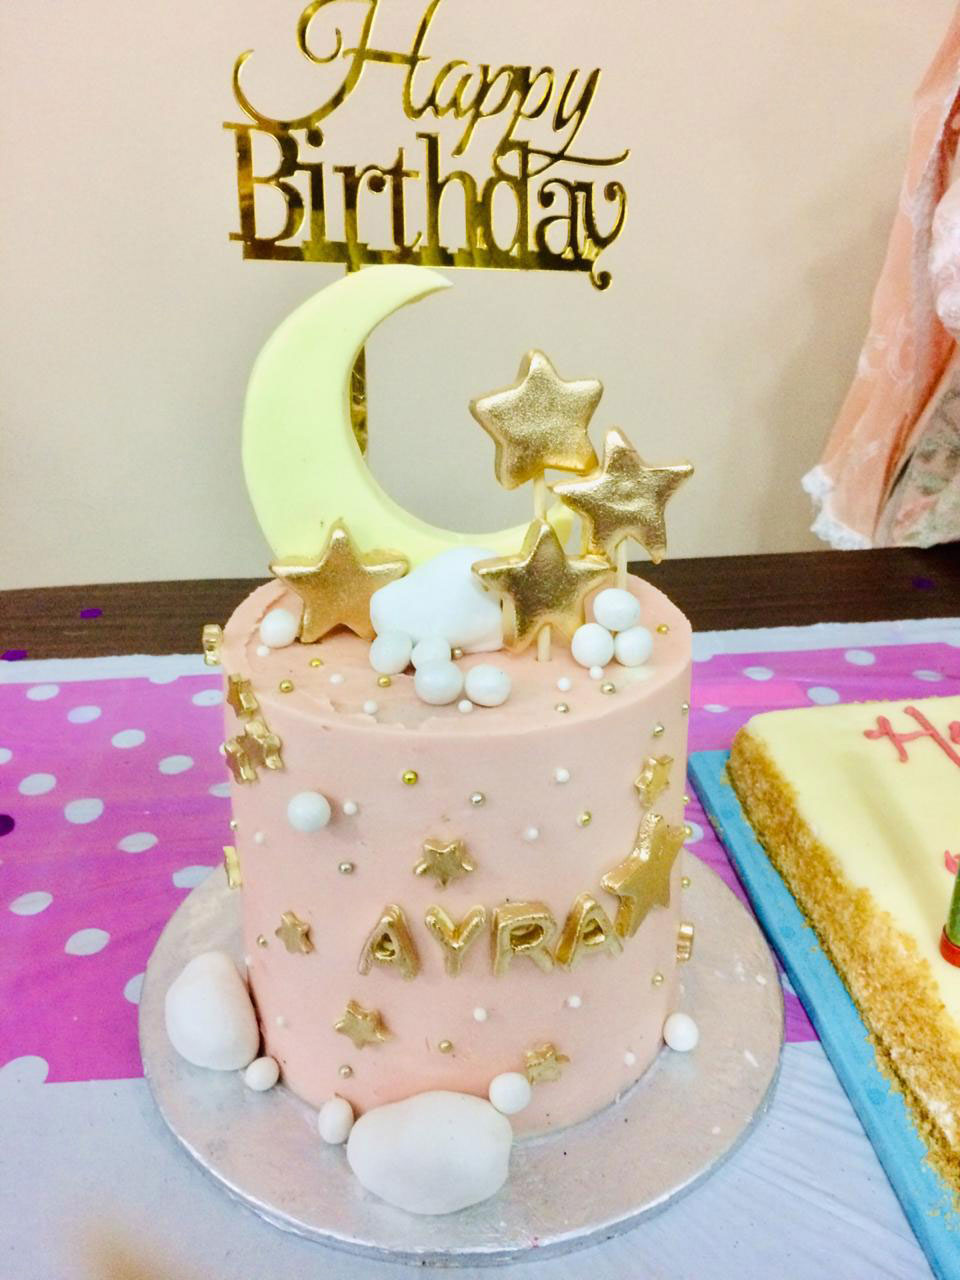 Baby Ayra's beautiful birthday cake